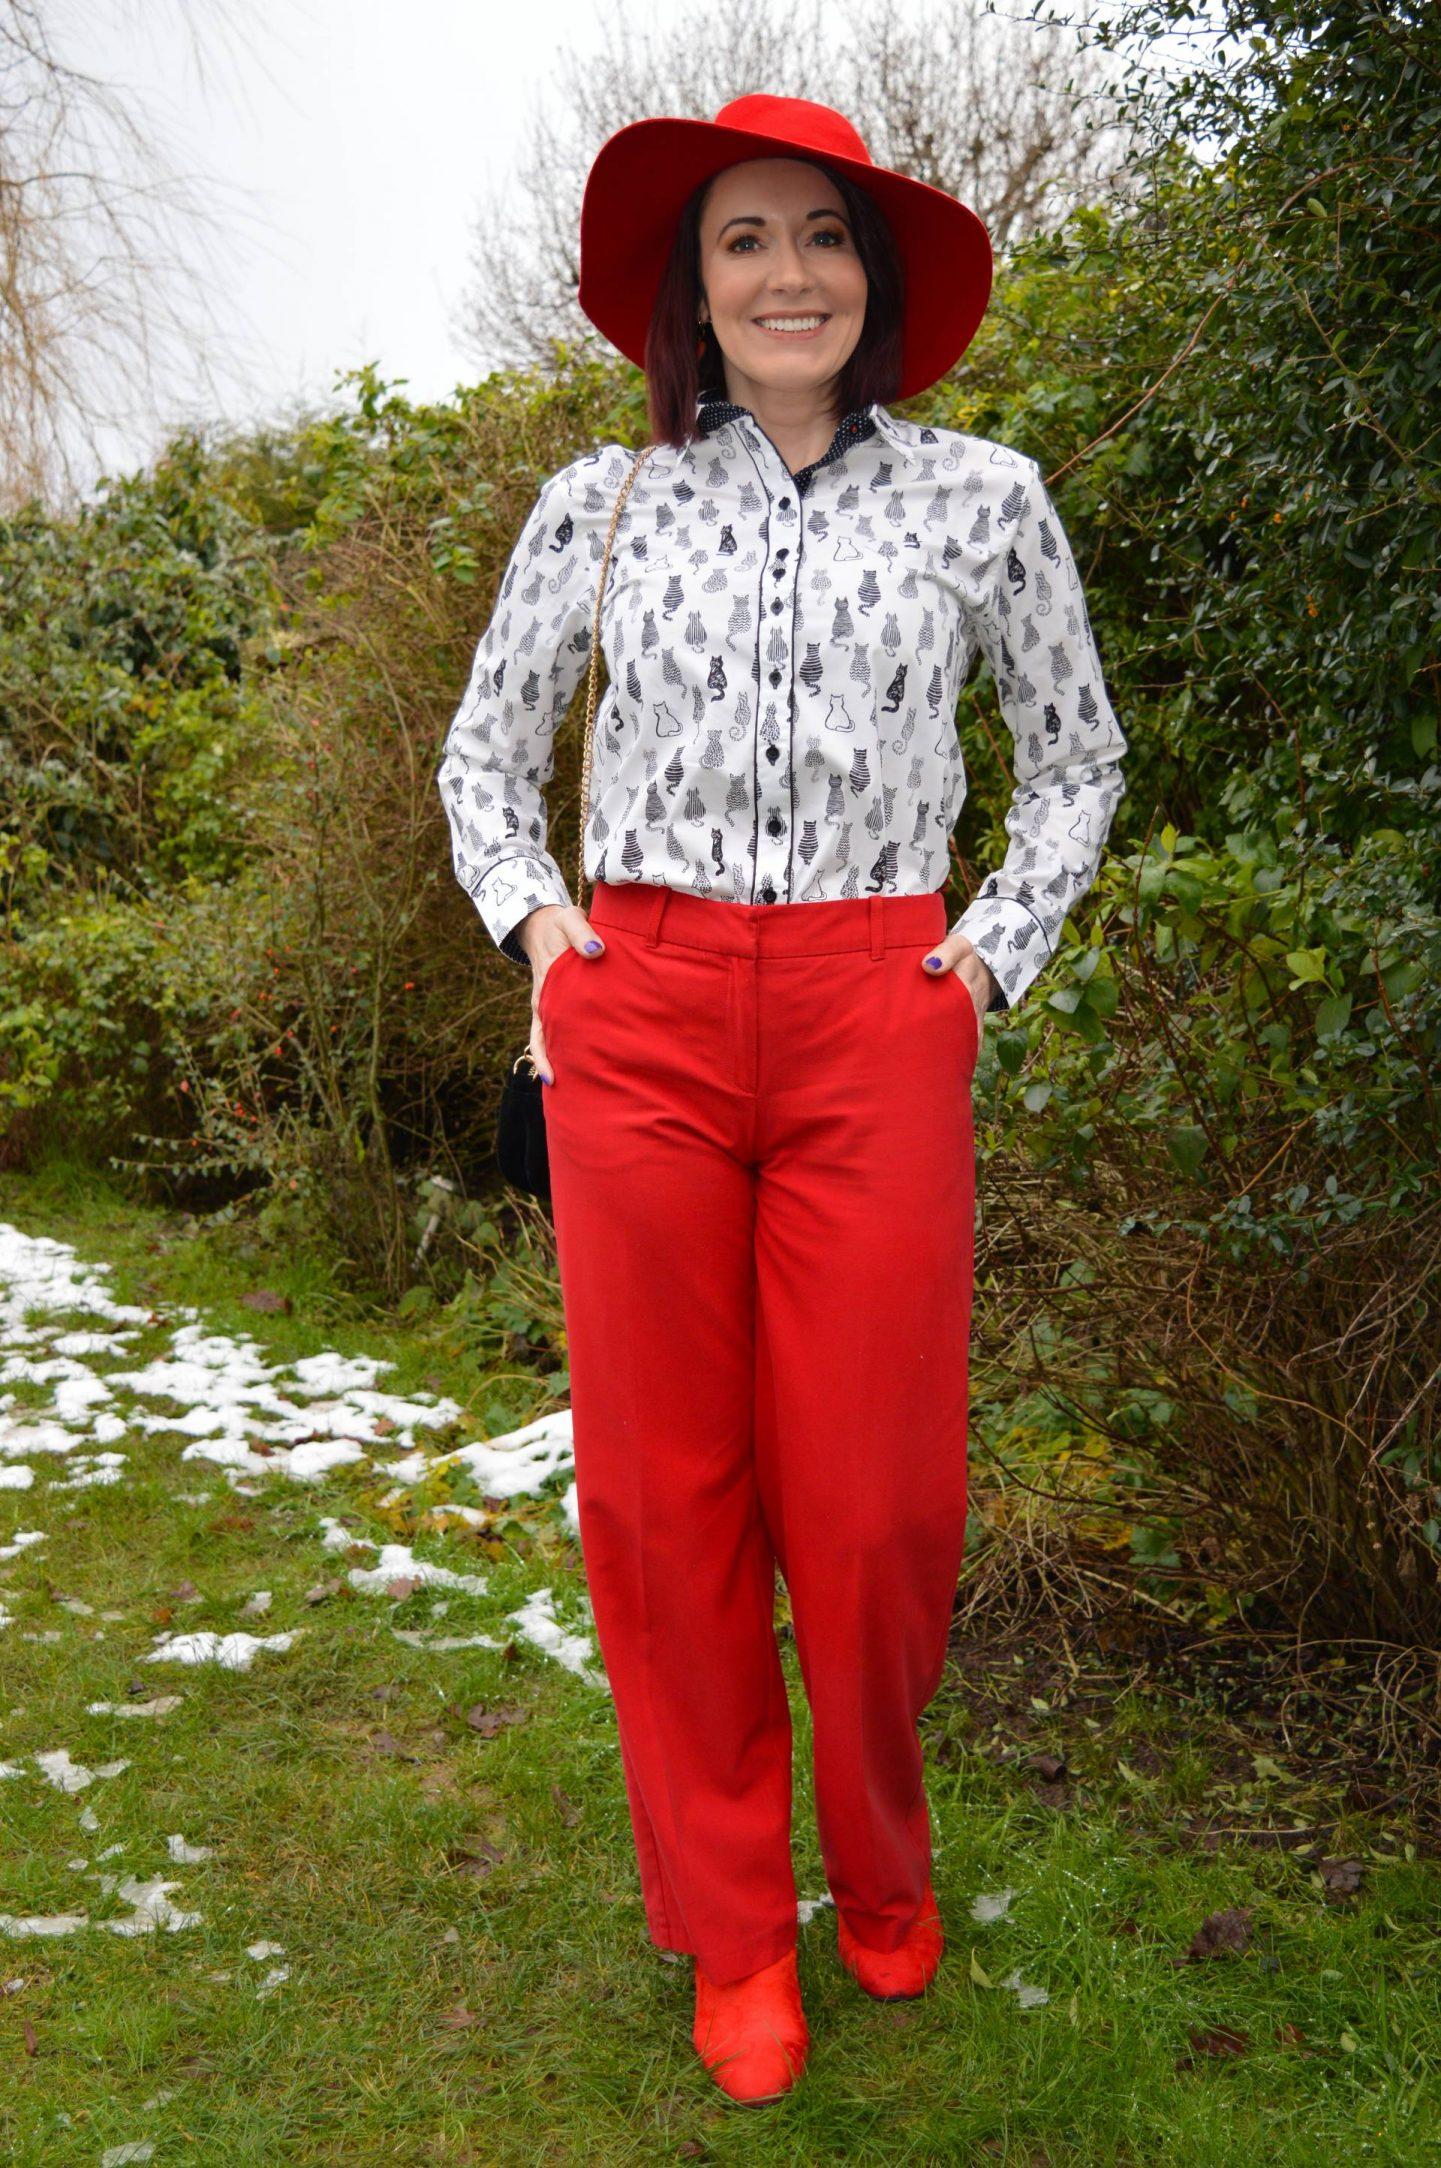 Salamander Shirts cat print shirt, Oasis red trousers, Zara red wide brim hat